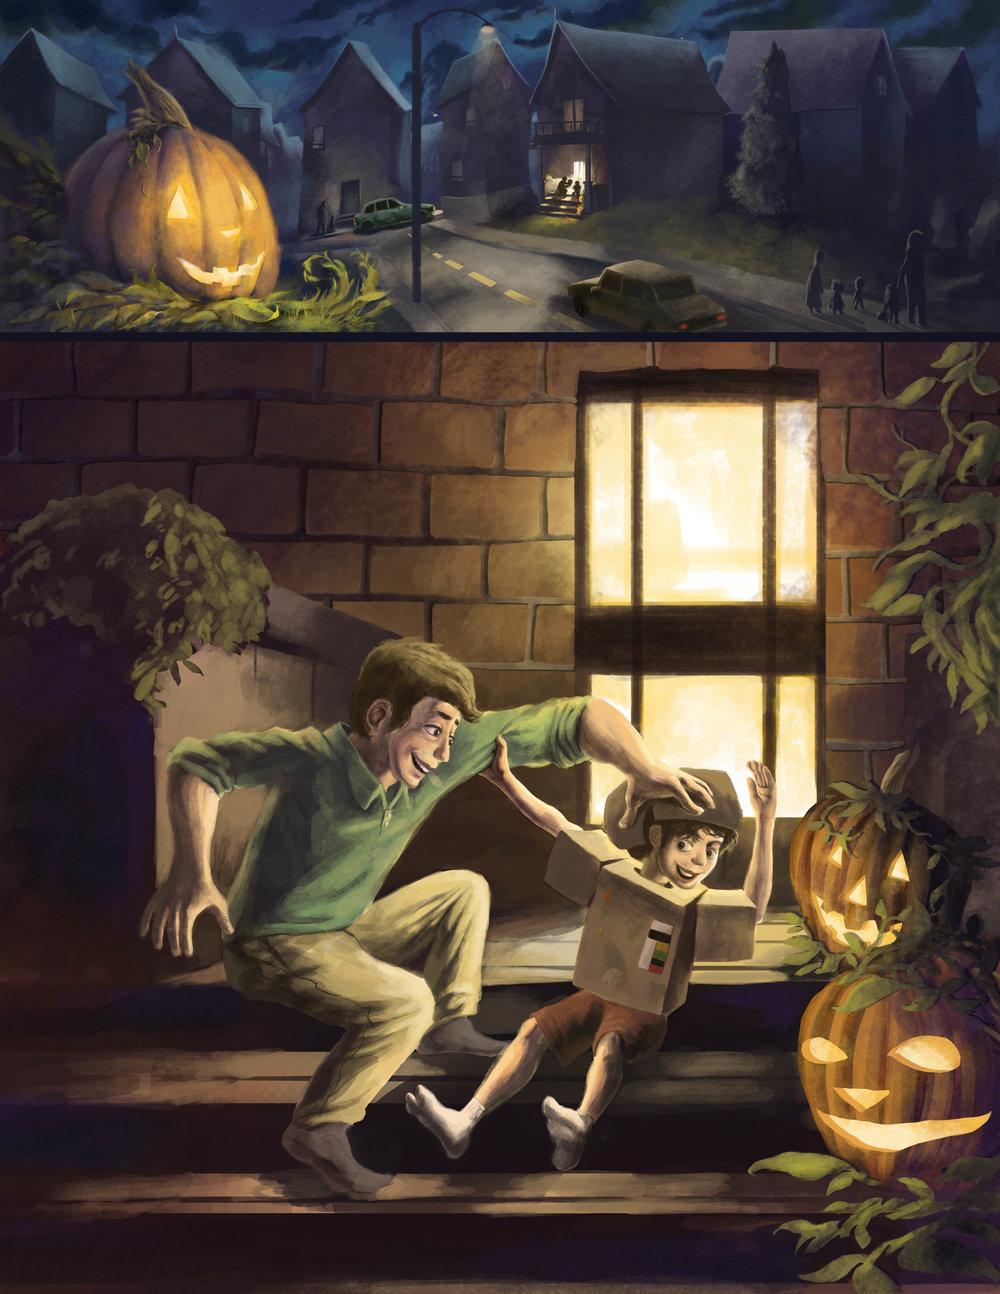 Giacomo the Pumpkin - Introduction